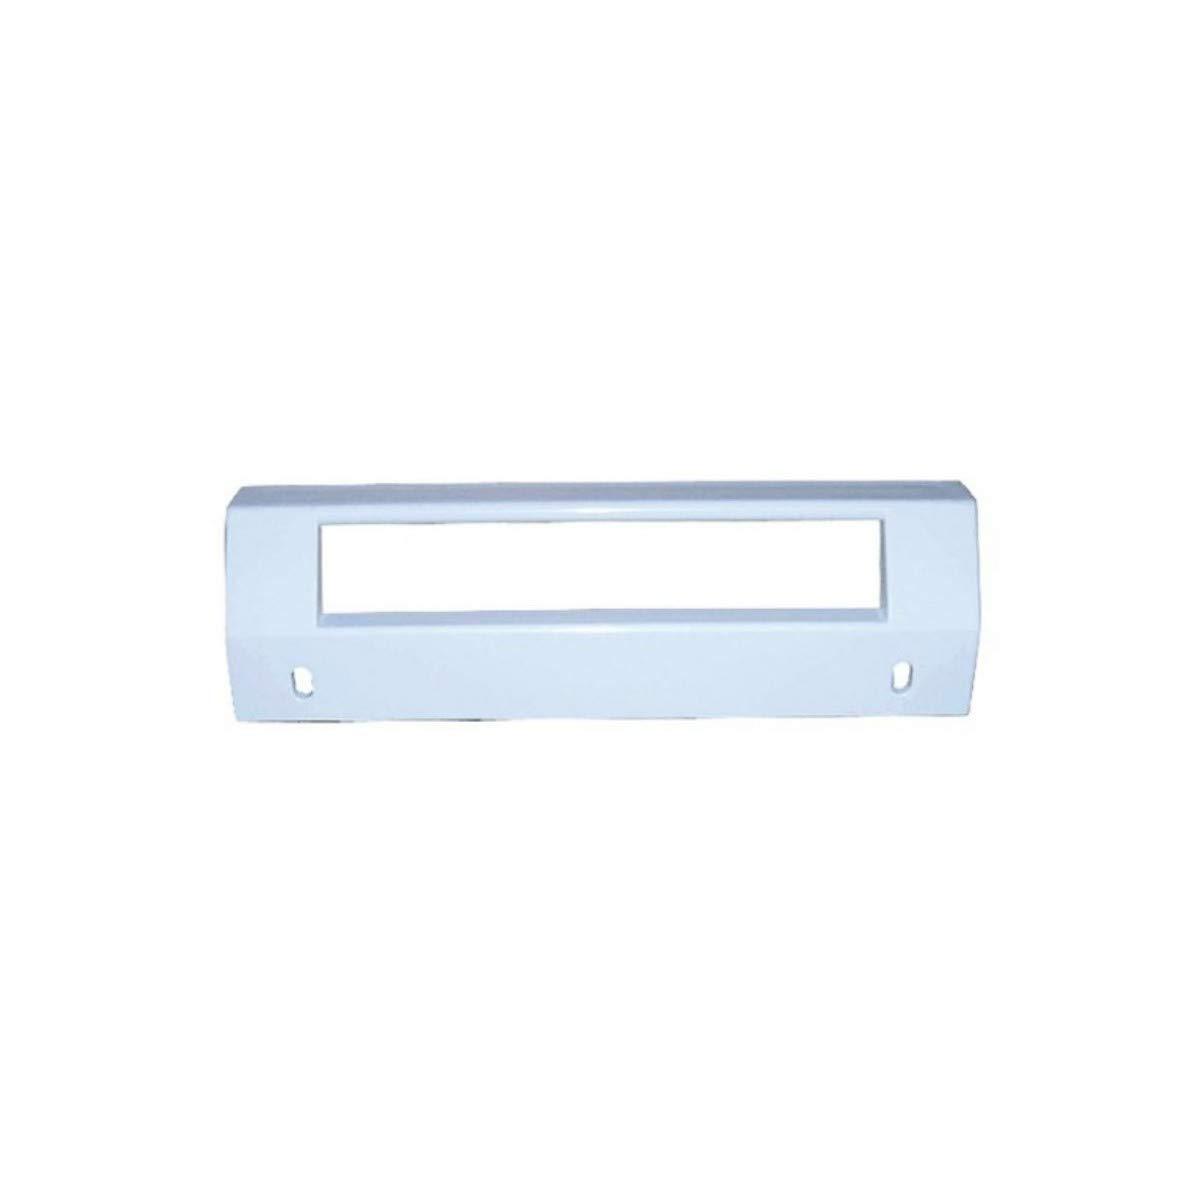 Recamania Tirador Puerta frigorifico Balay Blanco LF640 LF642 ...